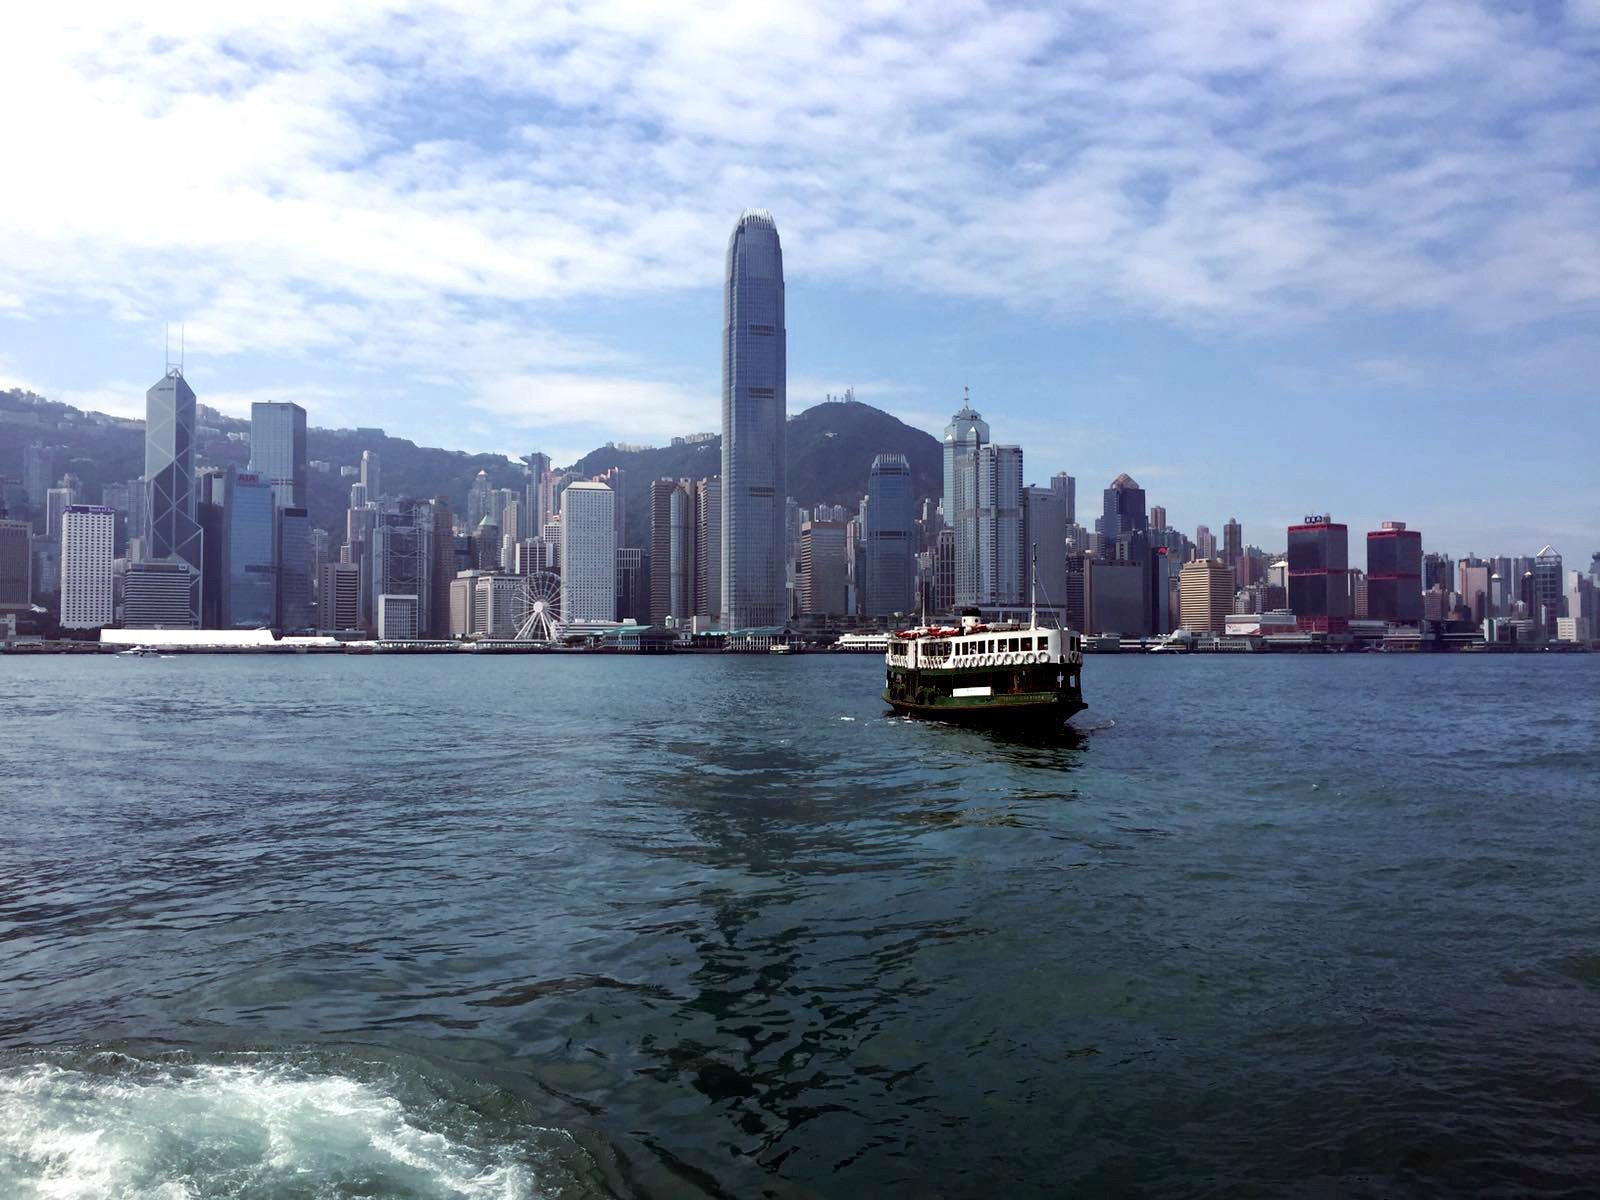 hongkong wierzowce statek iglawpodrozy